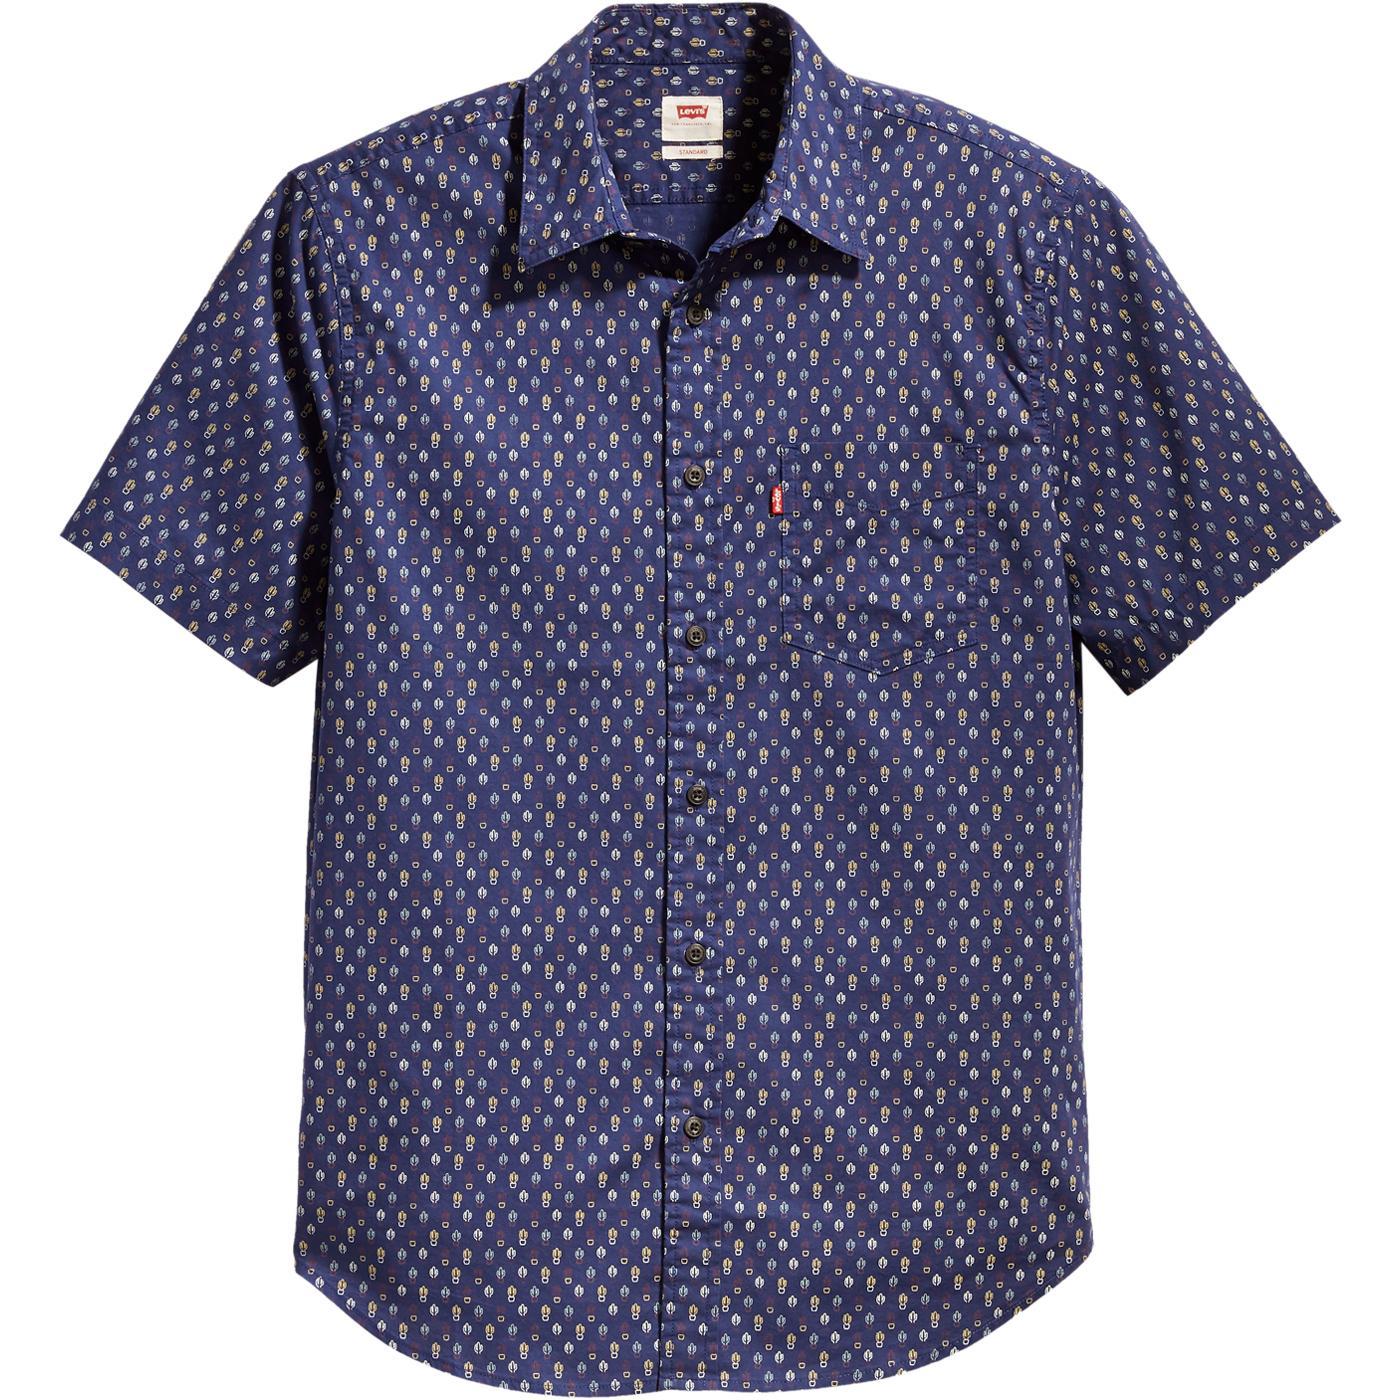 LEVI'S Retro 50s 1 Pocket Cactus Print Shirt (SB)